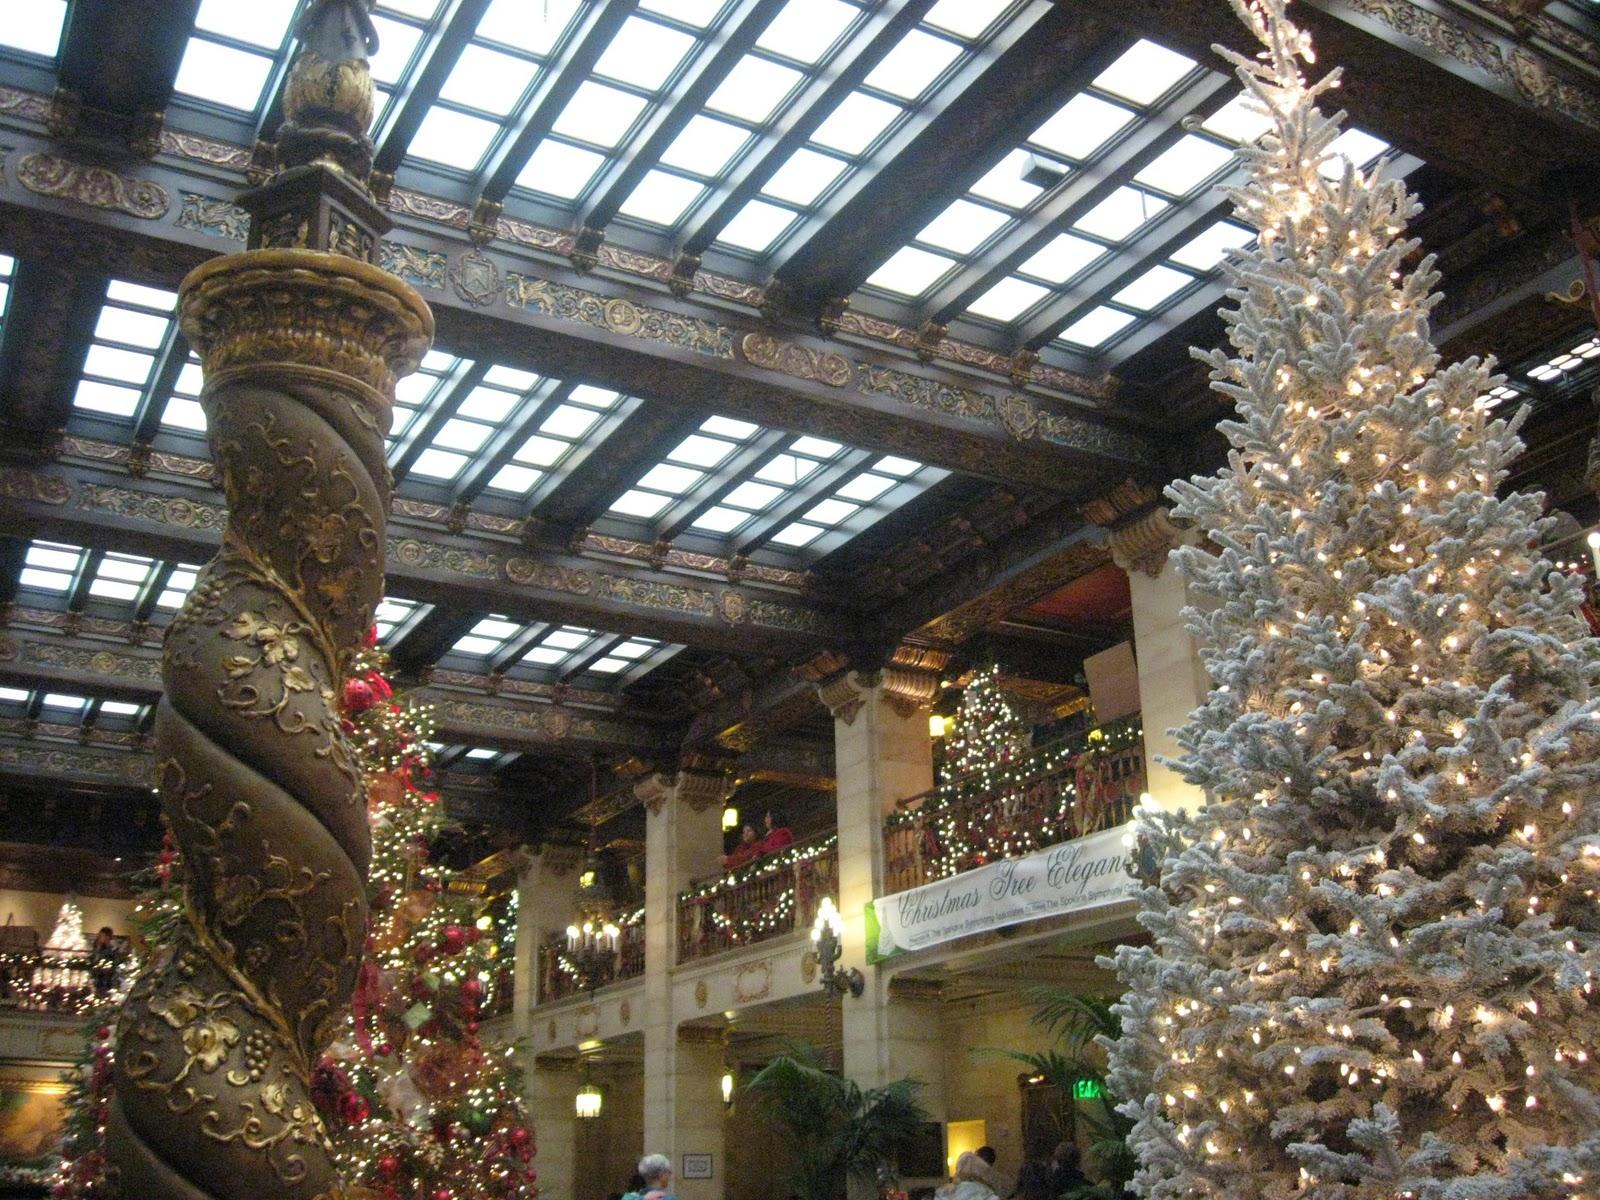 Davenport Hotel Christmas Tree Elegance 2021 Cheers To Christmas Tree Elegance At The Decadent Davenport Hotel